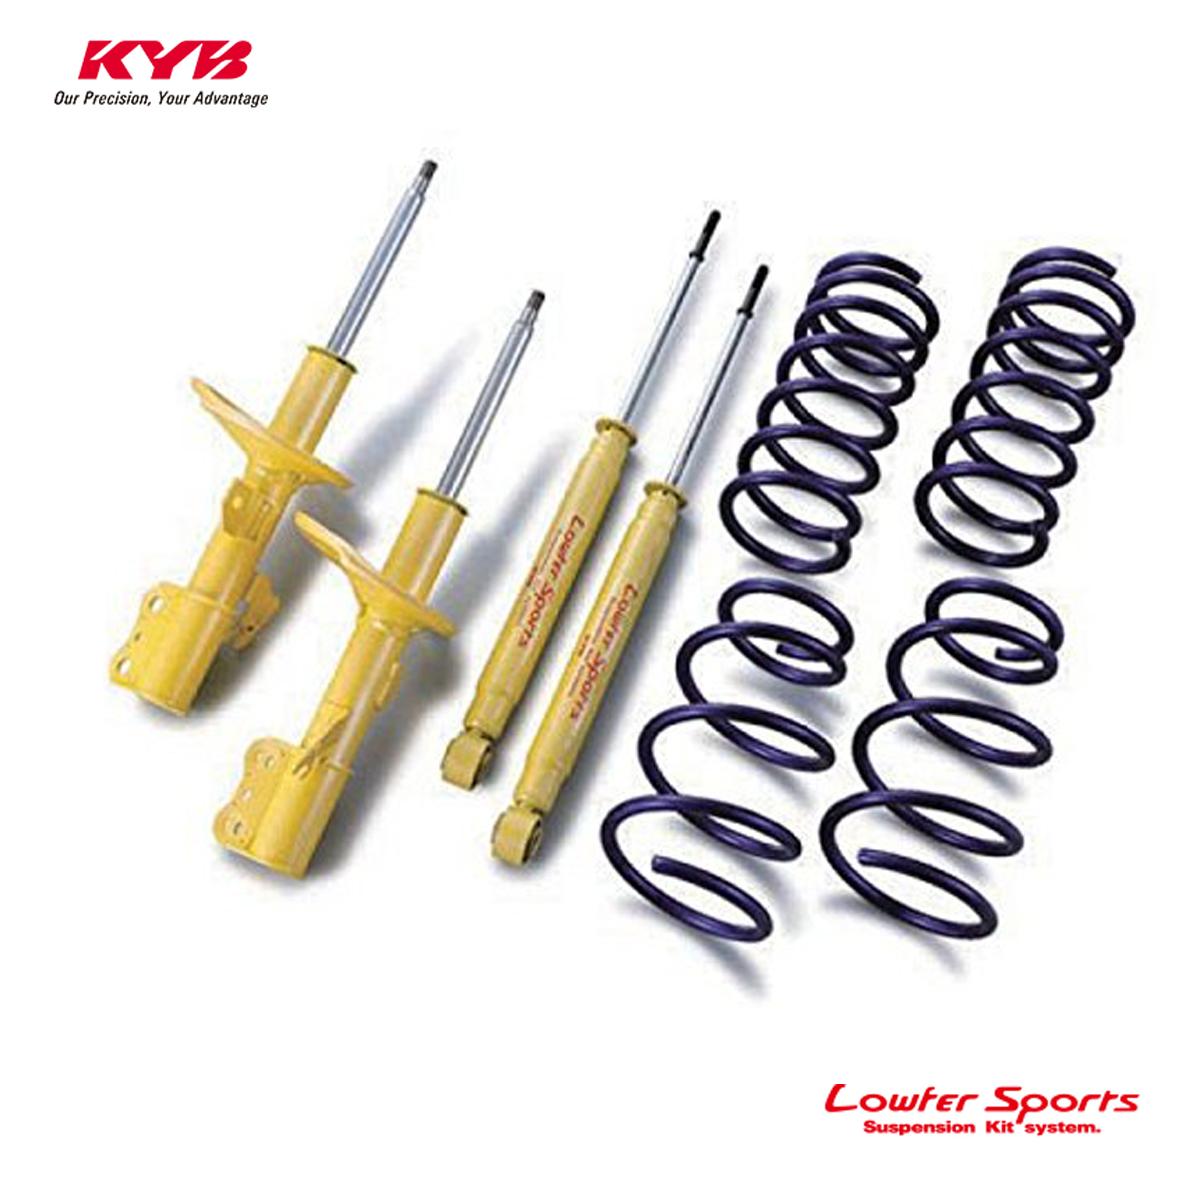 KYB カヤバ ワゴンR MC22S ショックアブソーバー サスペンションキット Lowfer Sports LKIT-MC22S403 配送先条件有り